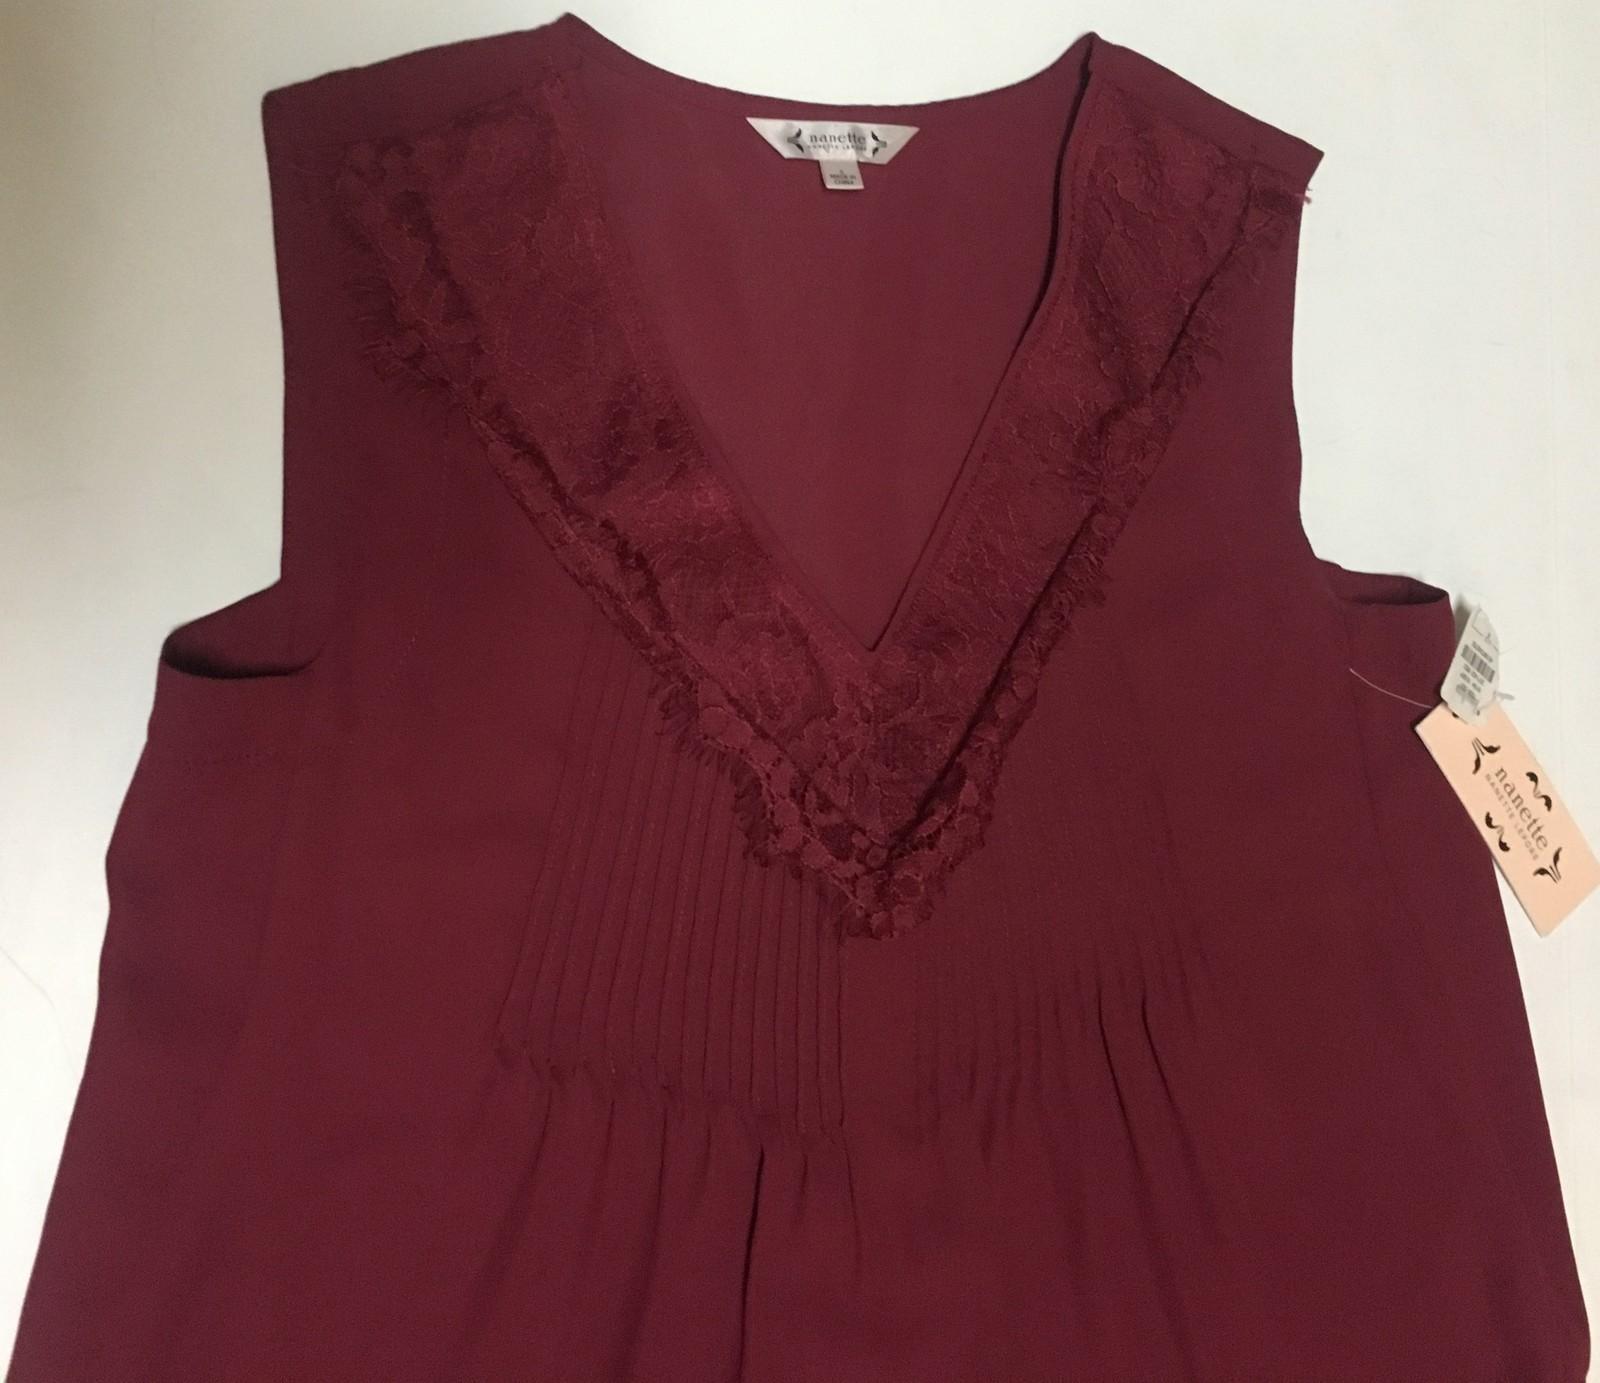 Nanette Lepore Summer Blouse Cranberry Sleeveless Sz S